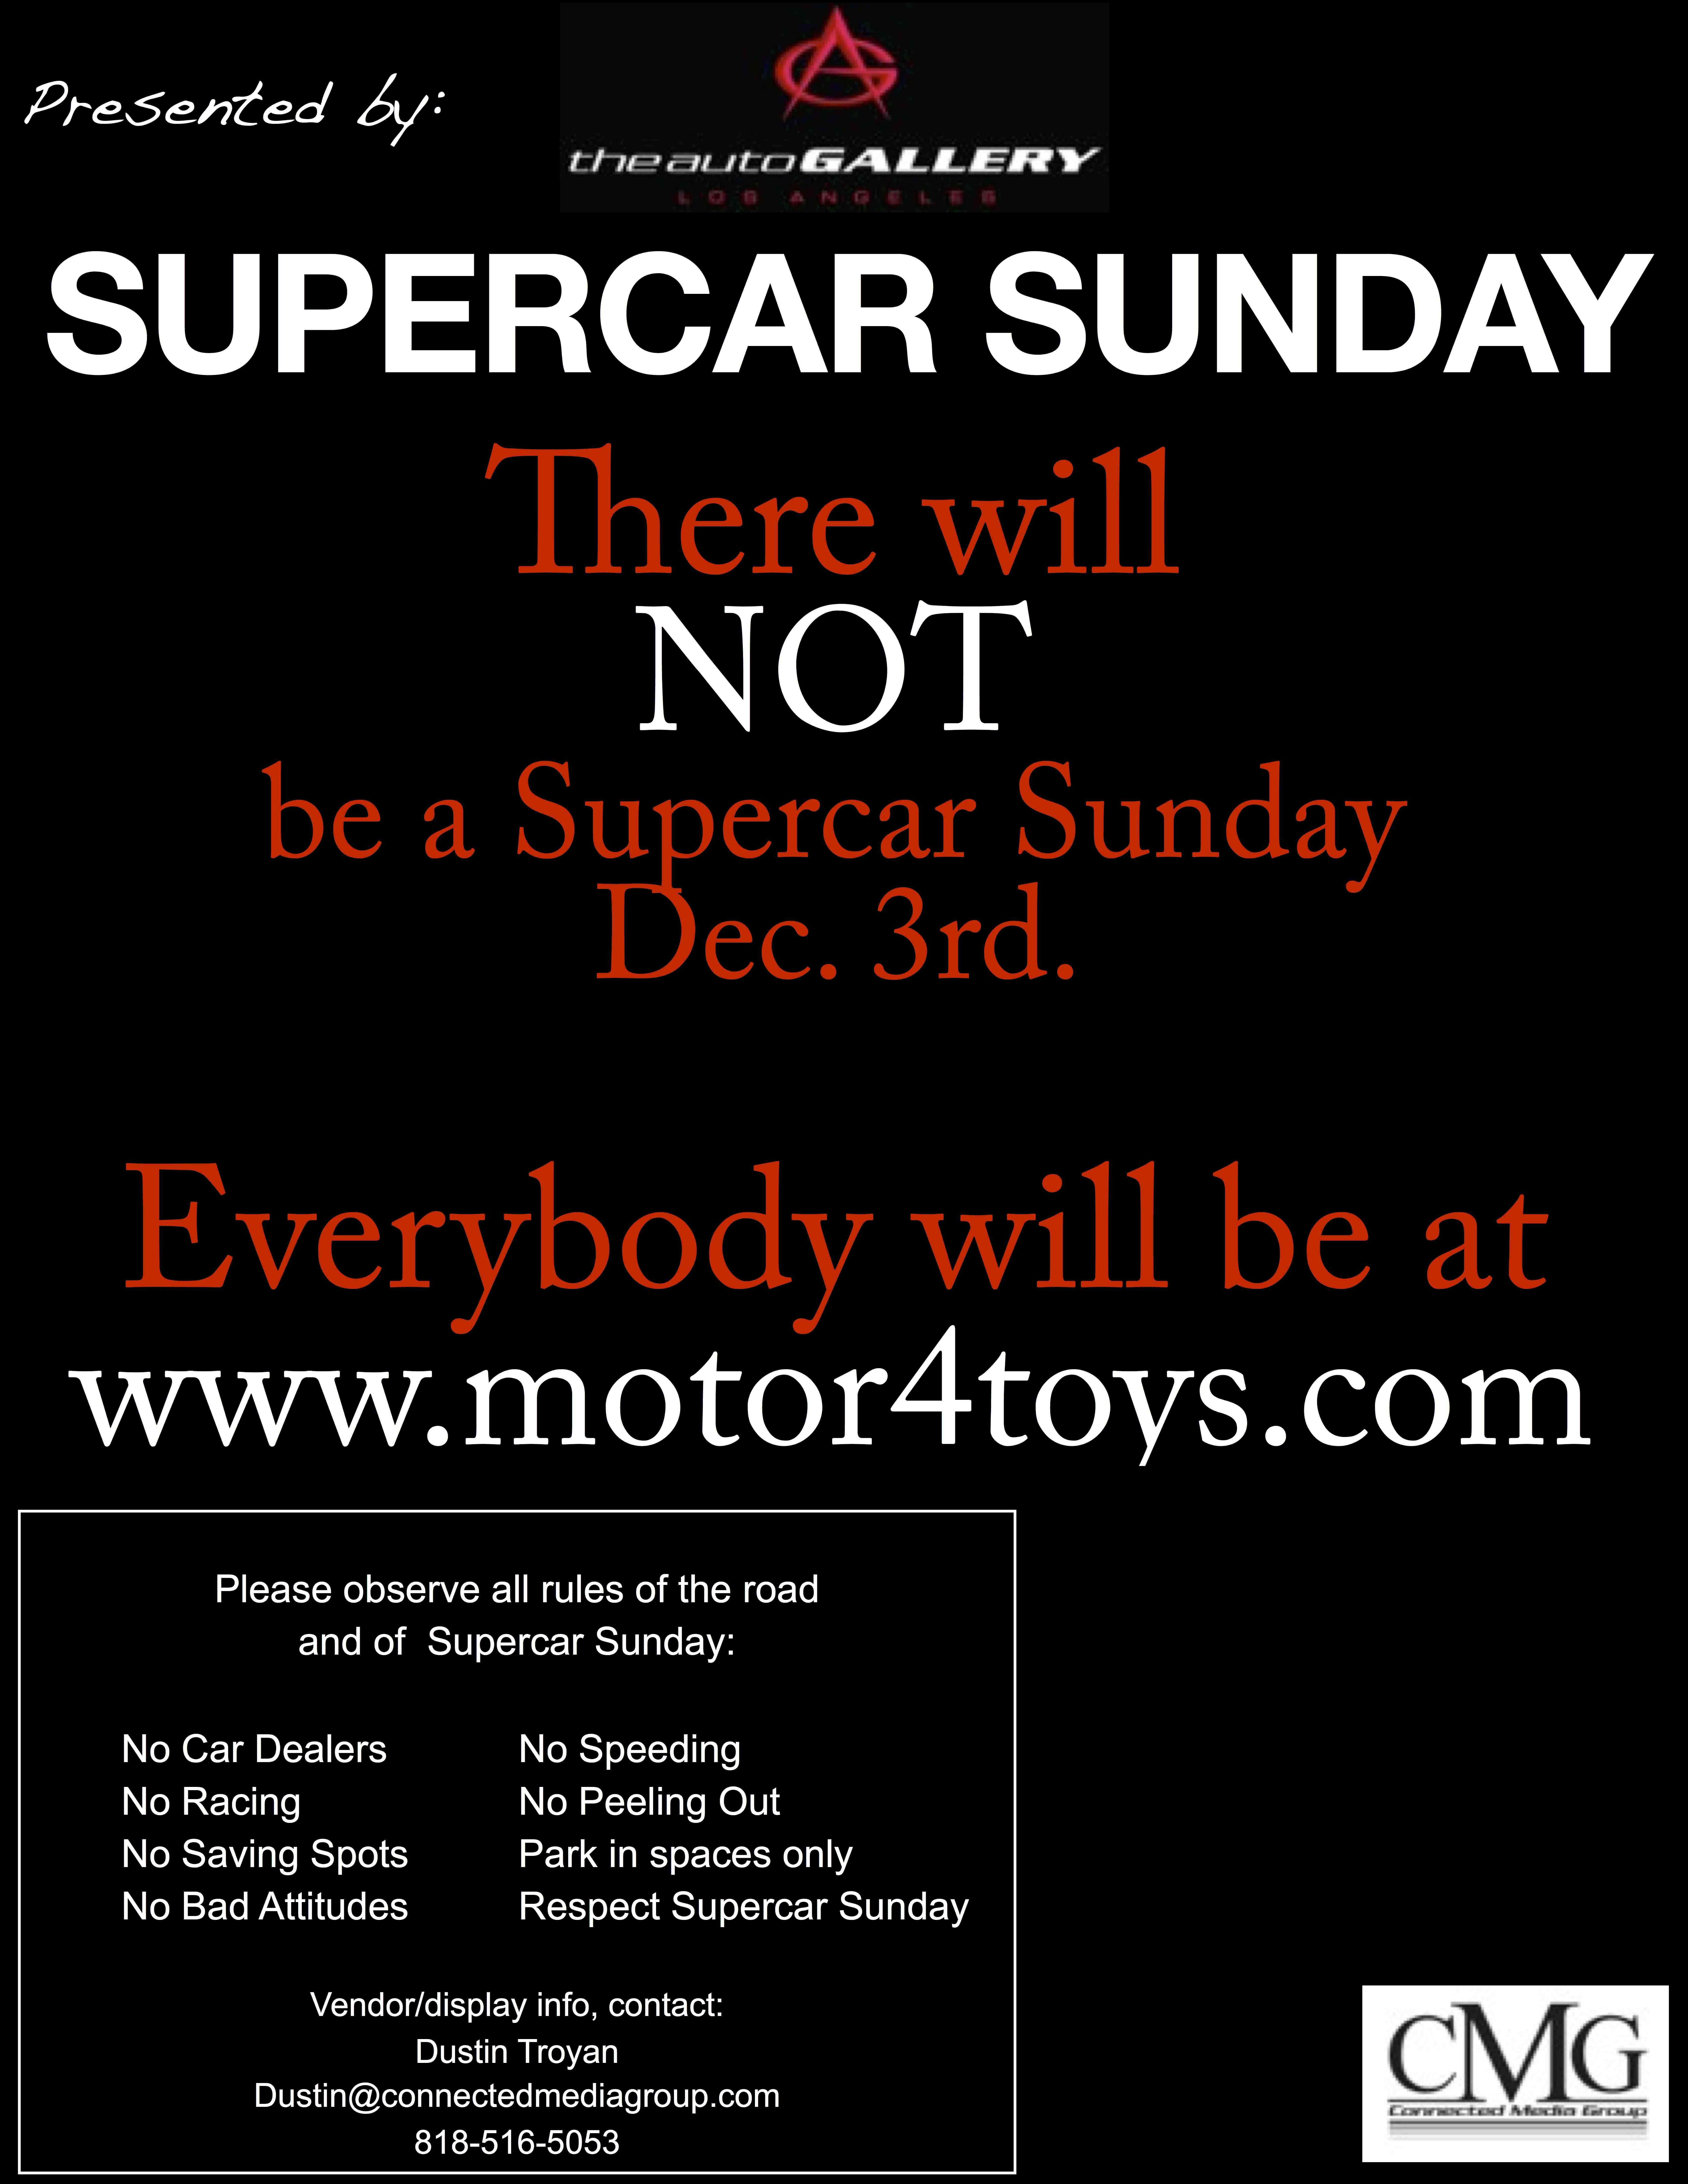 Motor4toys_SCS